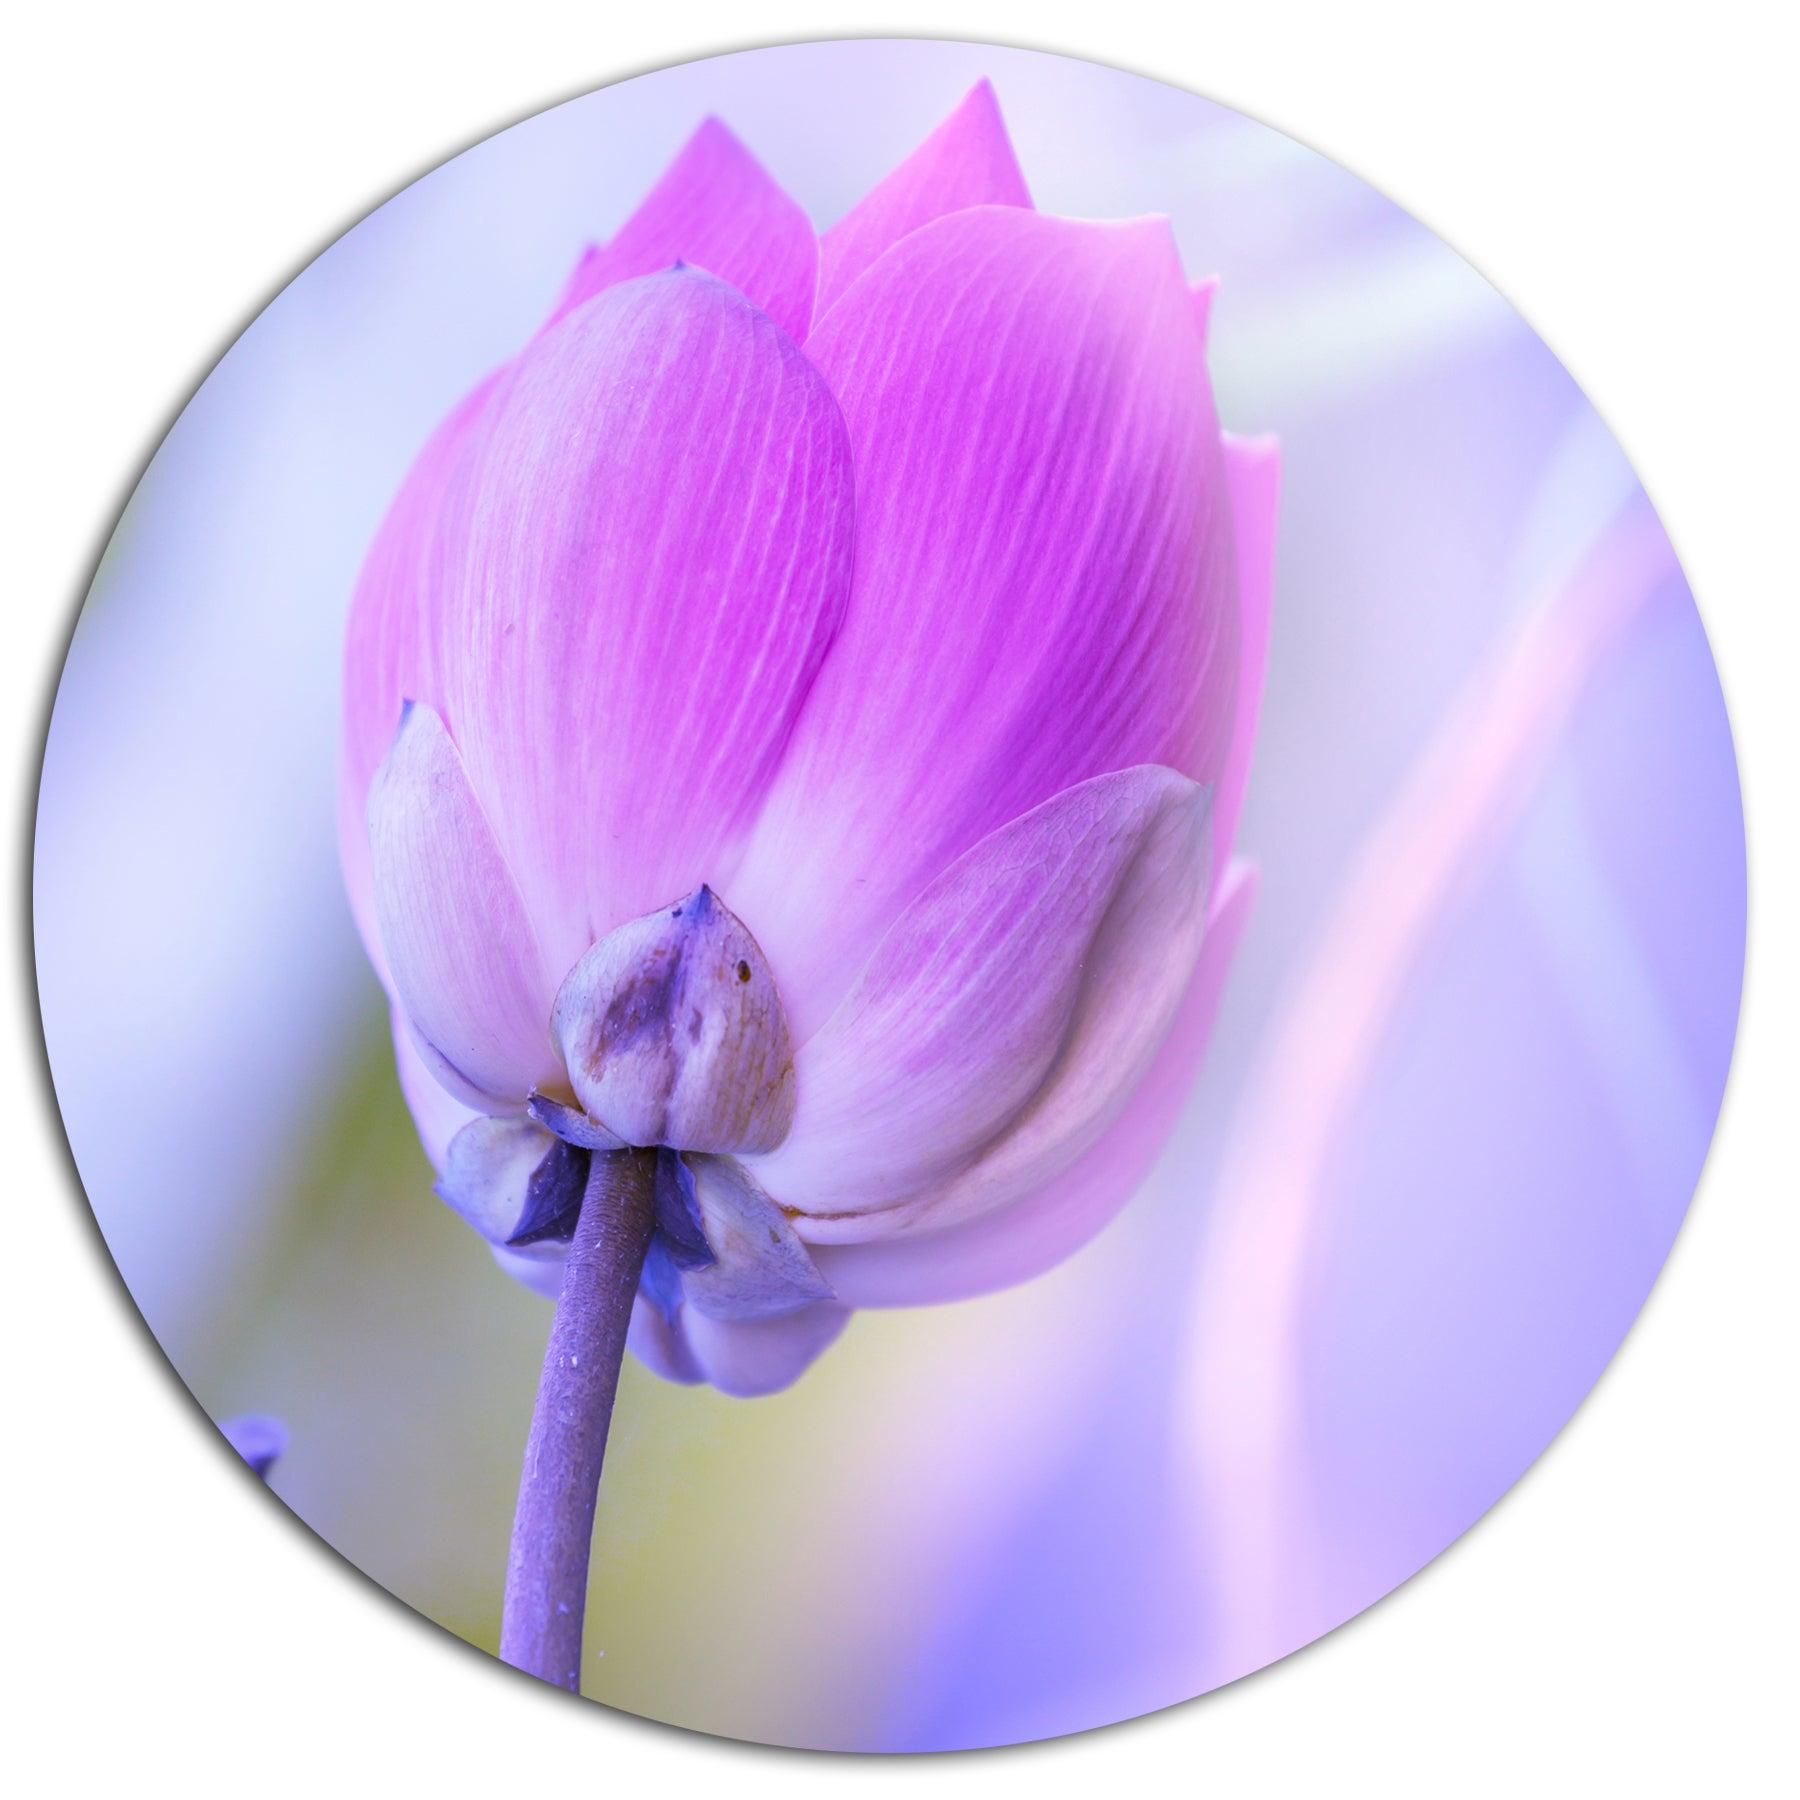 Shop designart large single lotus flower contemporary flower metal shop designart large single lotus flower contemporary flower metal wall art free shipping today overstock 20292117 izmirmasajfo